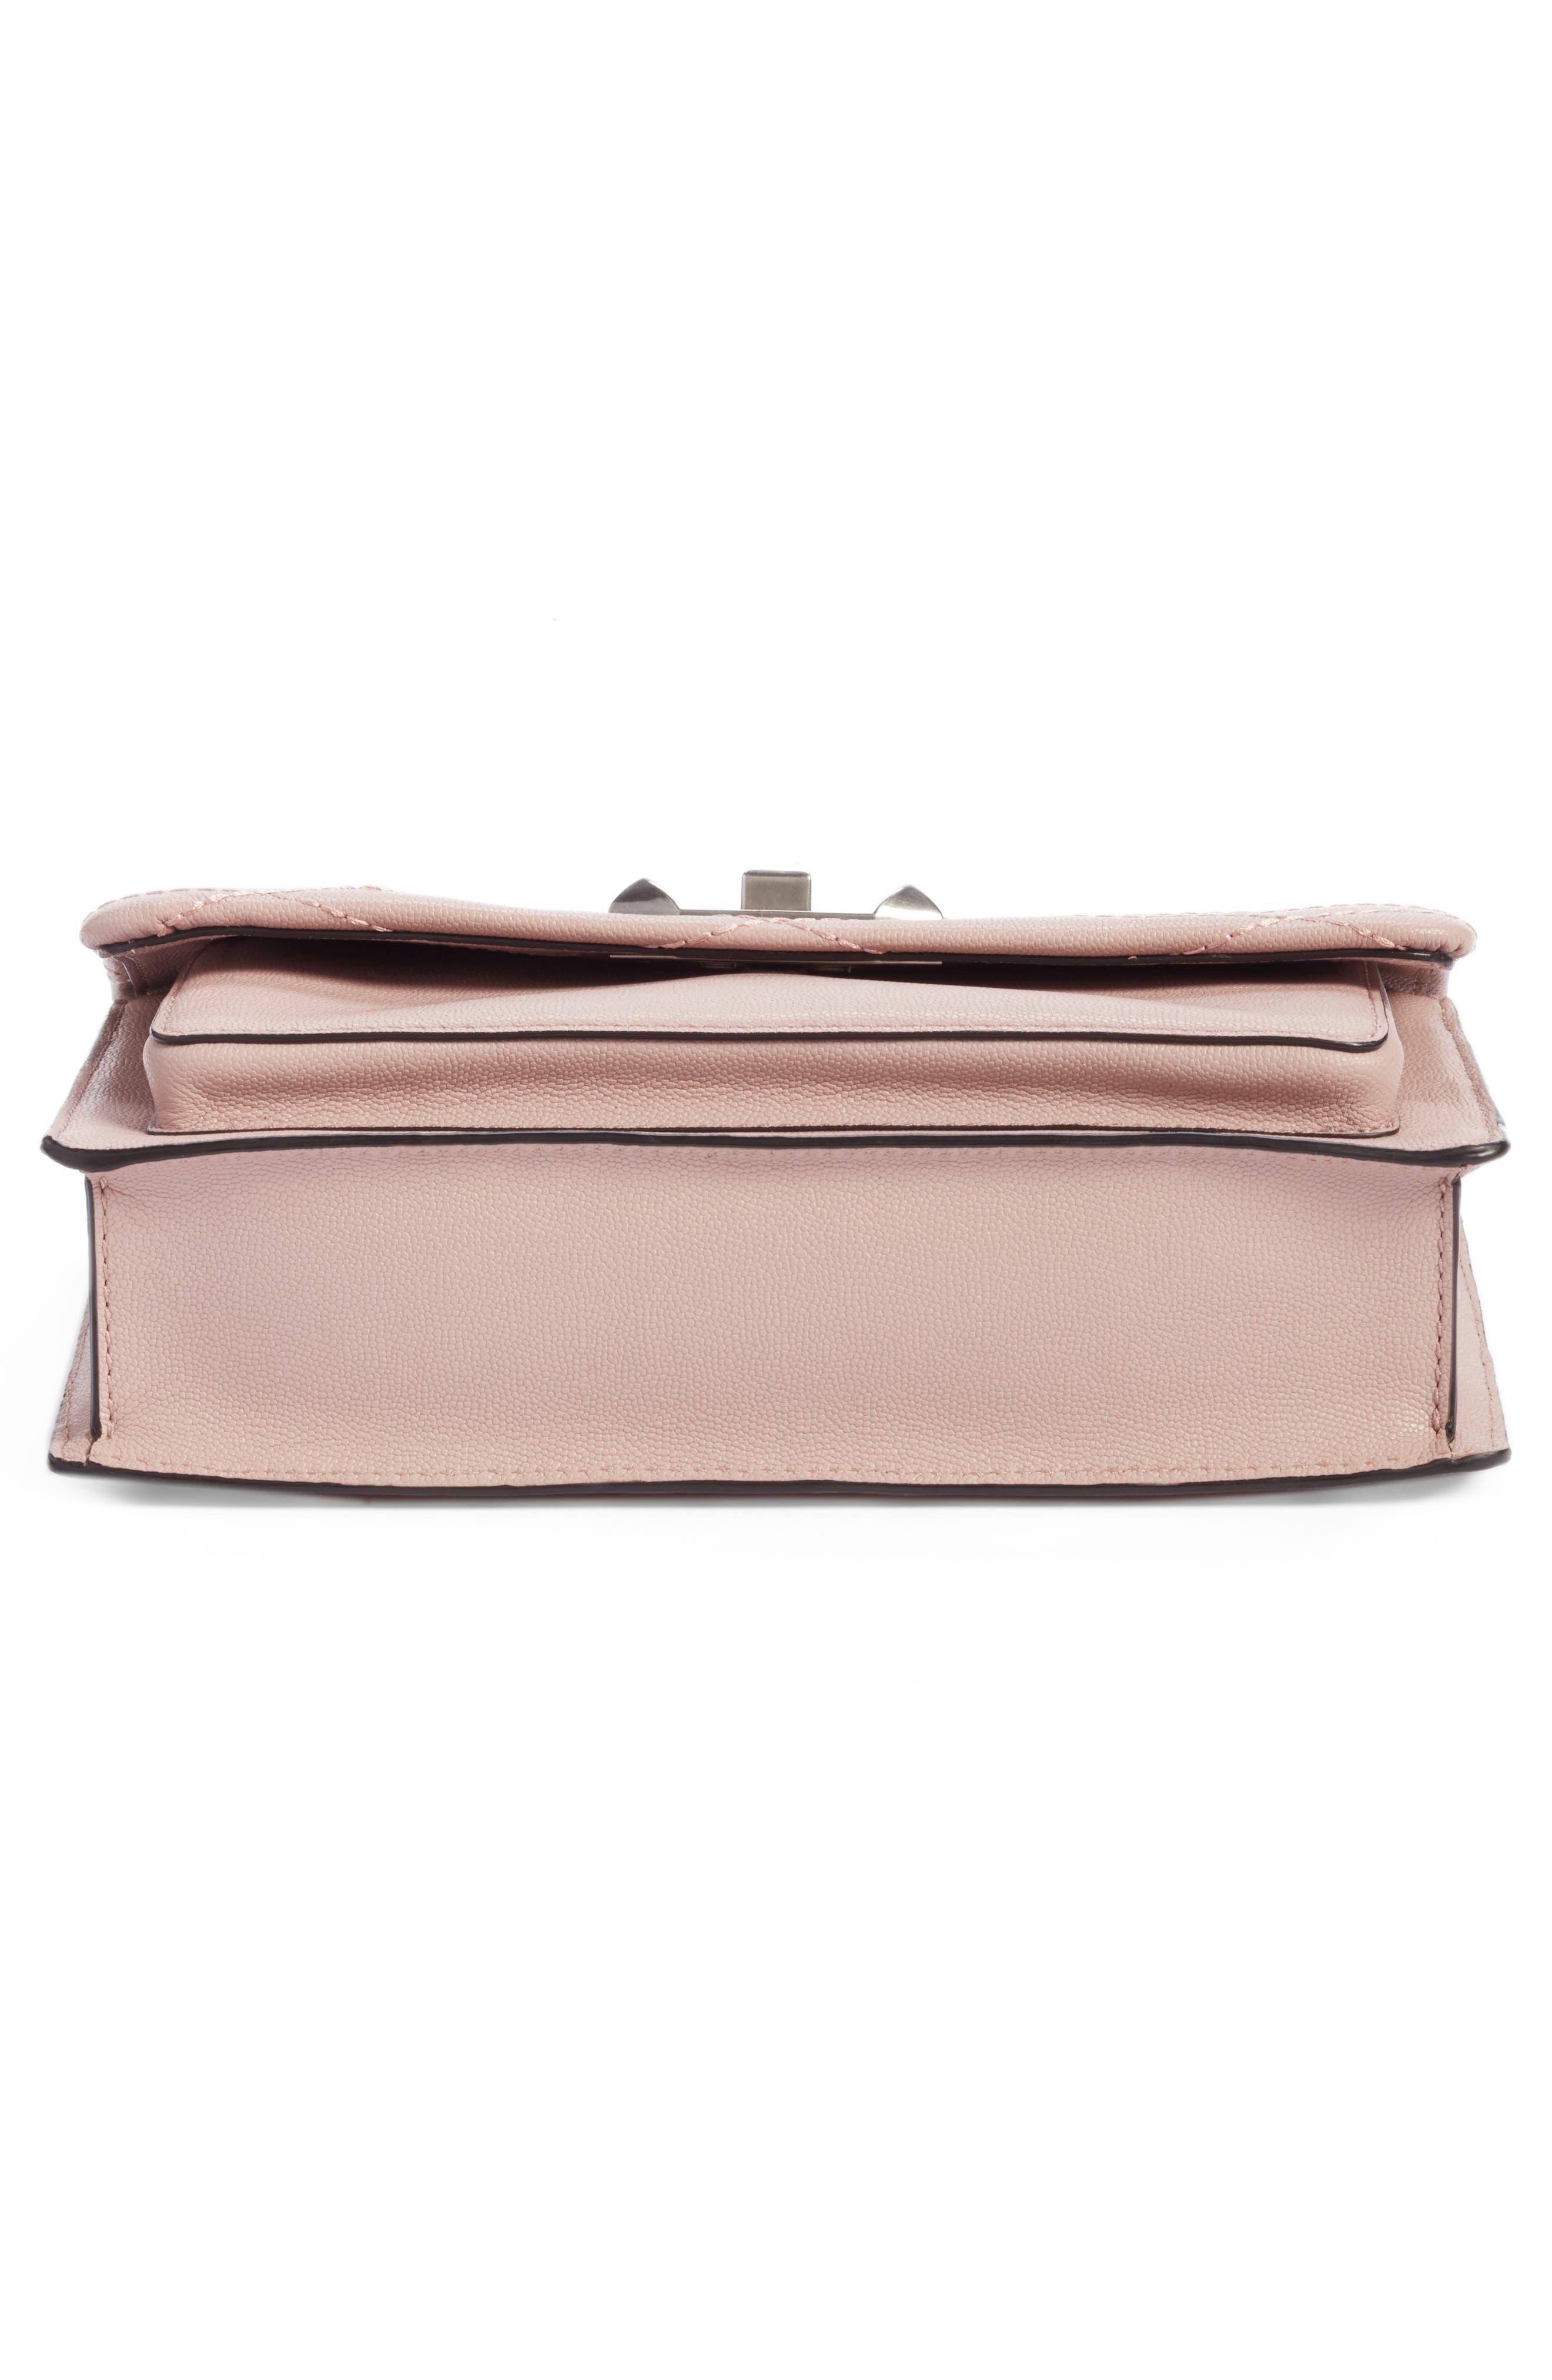 Medium Je T'aime Convertible Leather Crossbody Bag,                             Alternate thumbnail 58, color,